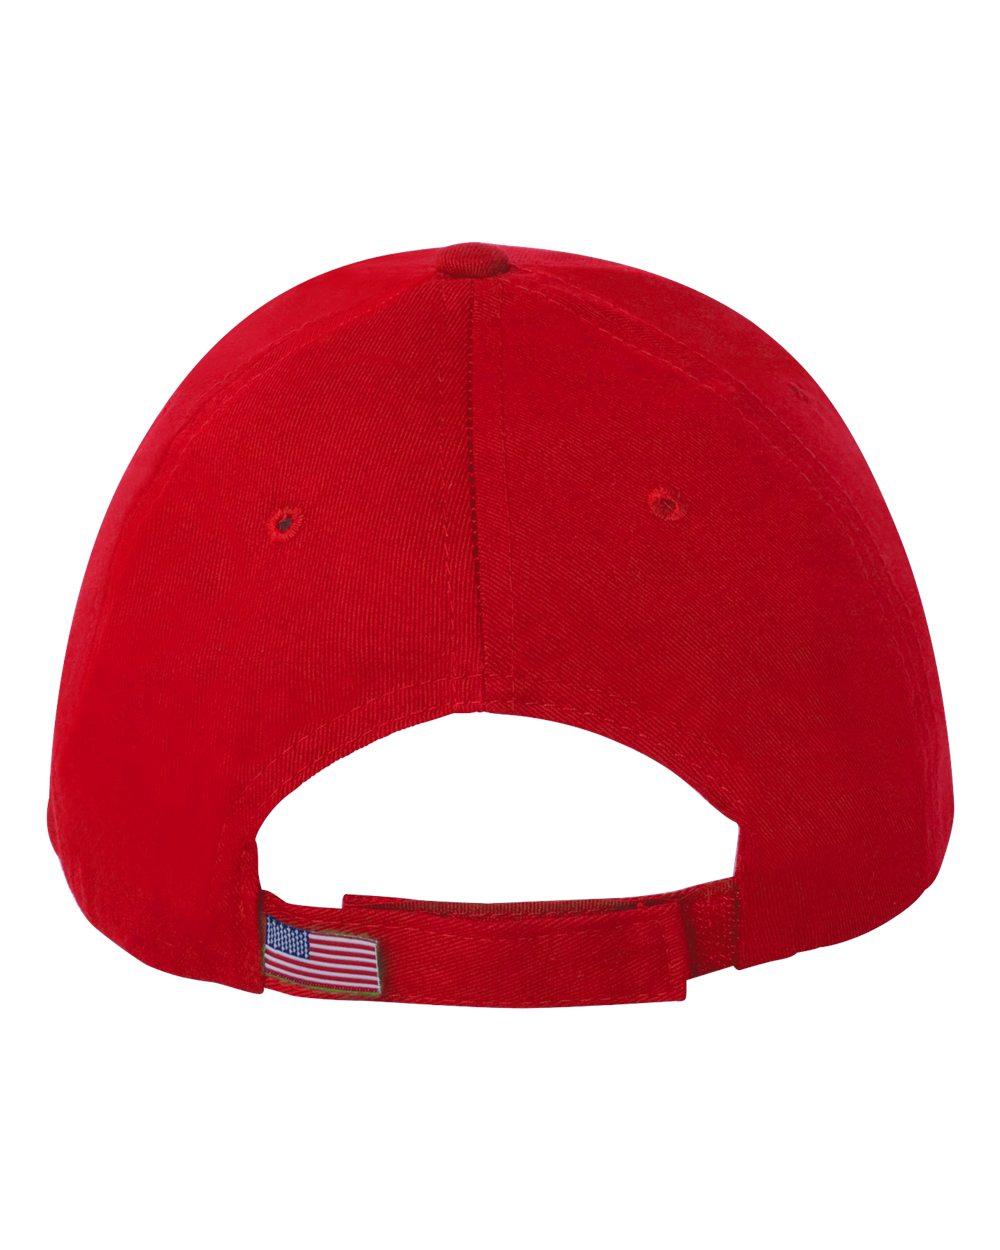 Bayside-Mens-Baseball-USA-Made-Structured-Cap-Hat-3660-six-panel-mid-profile thumbnail 10